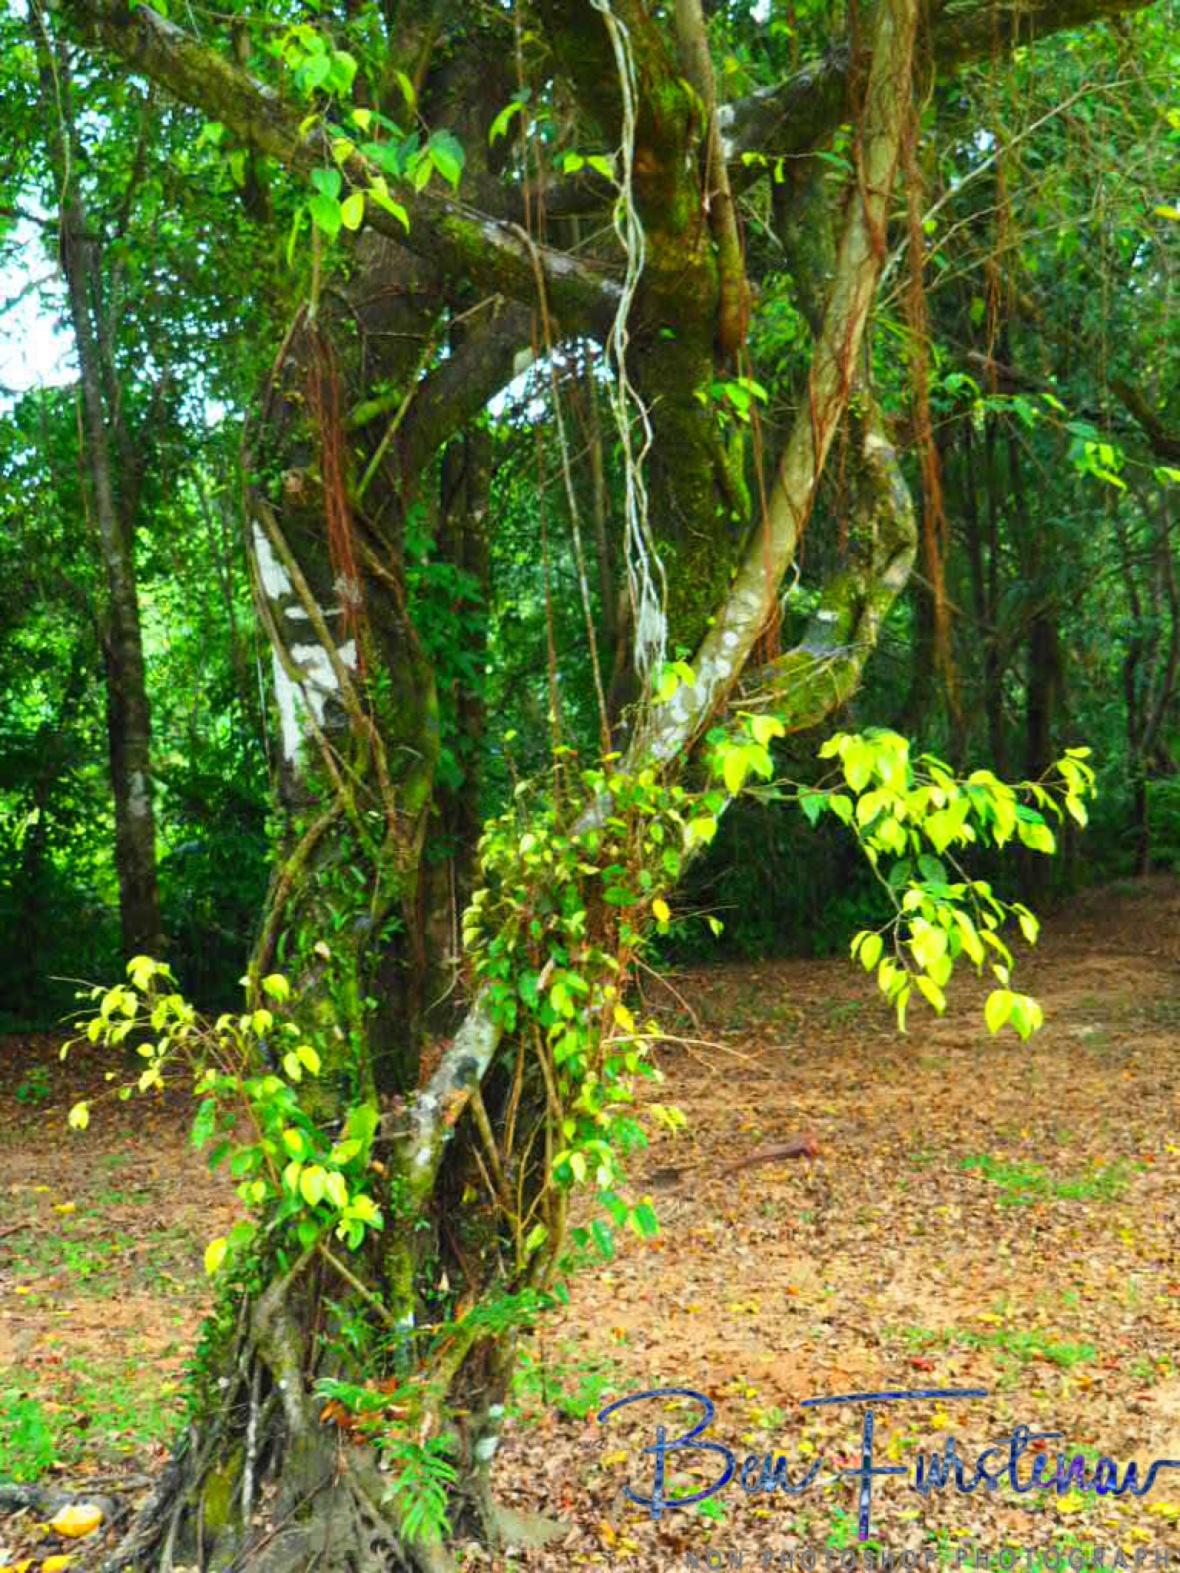 Camping area not far at Babinda, Tropical Northern Queensland, Australia